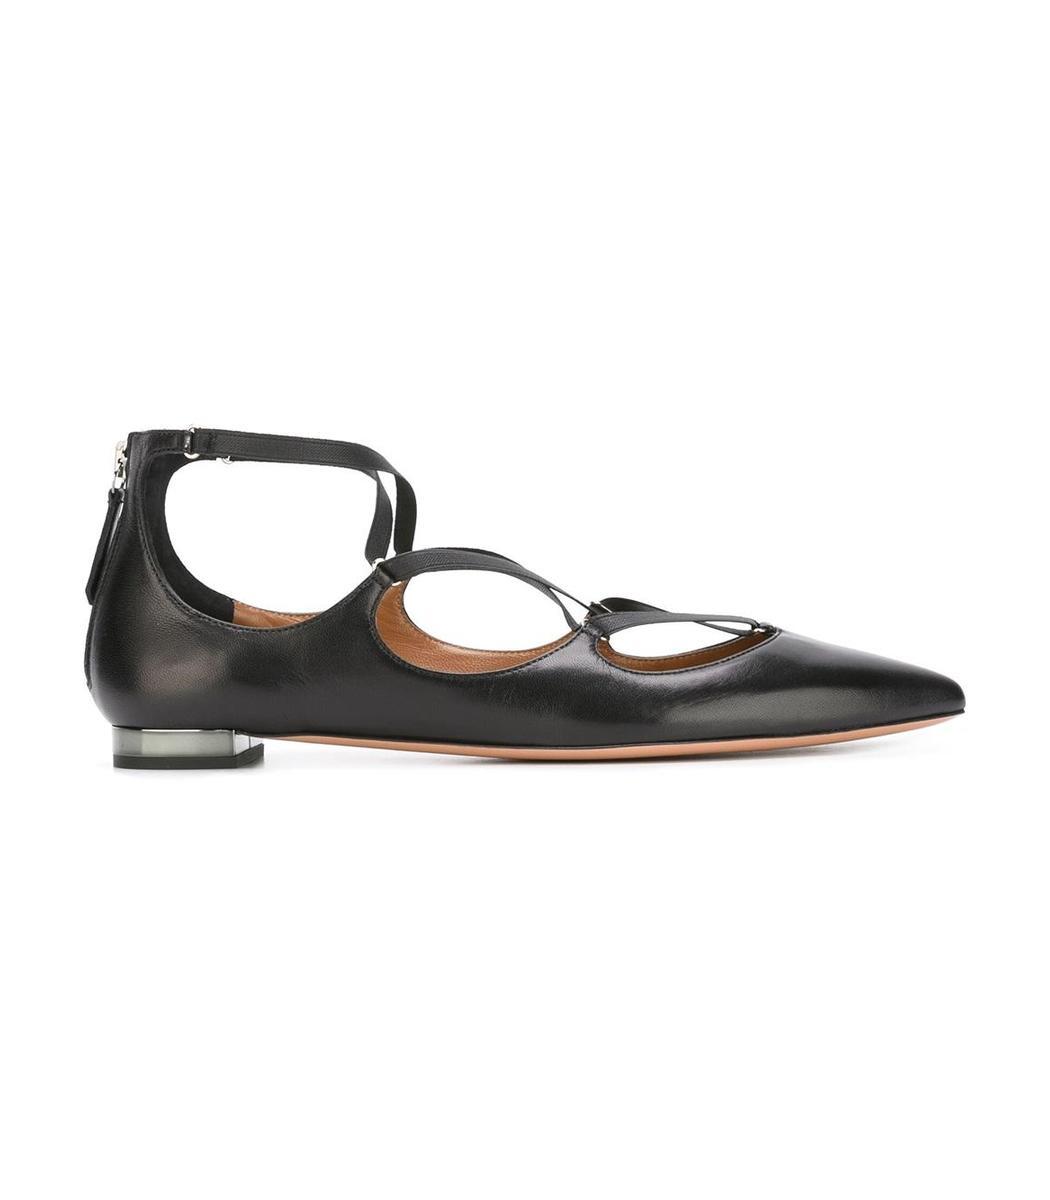 Aquazzura Leathers Black 'Christy' Ballerina Flat